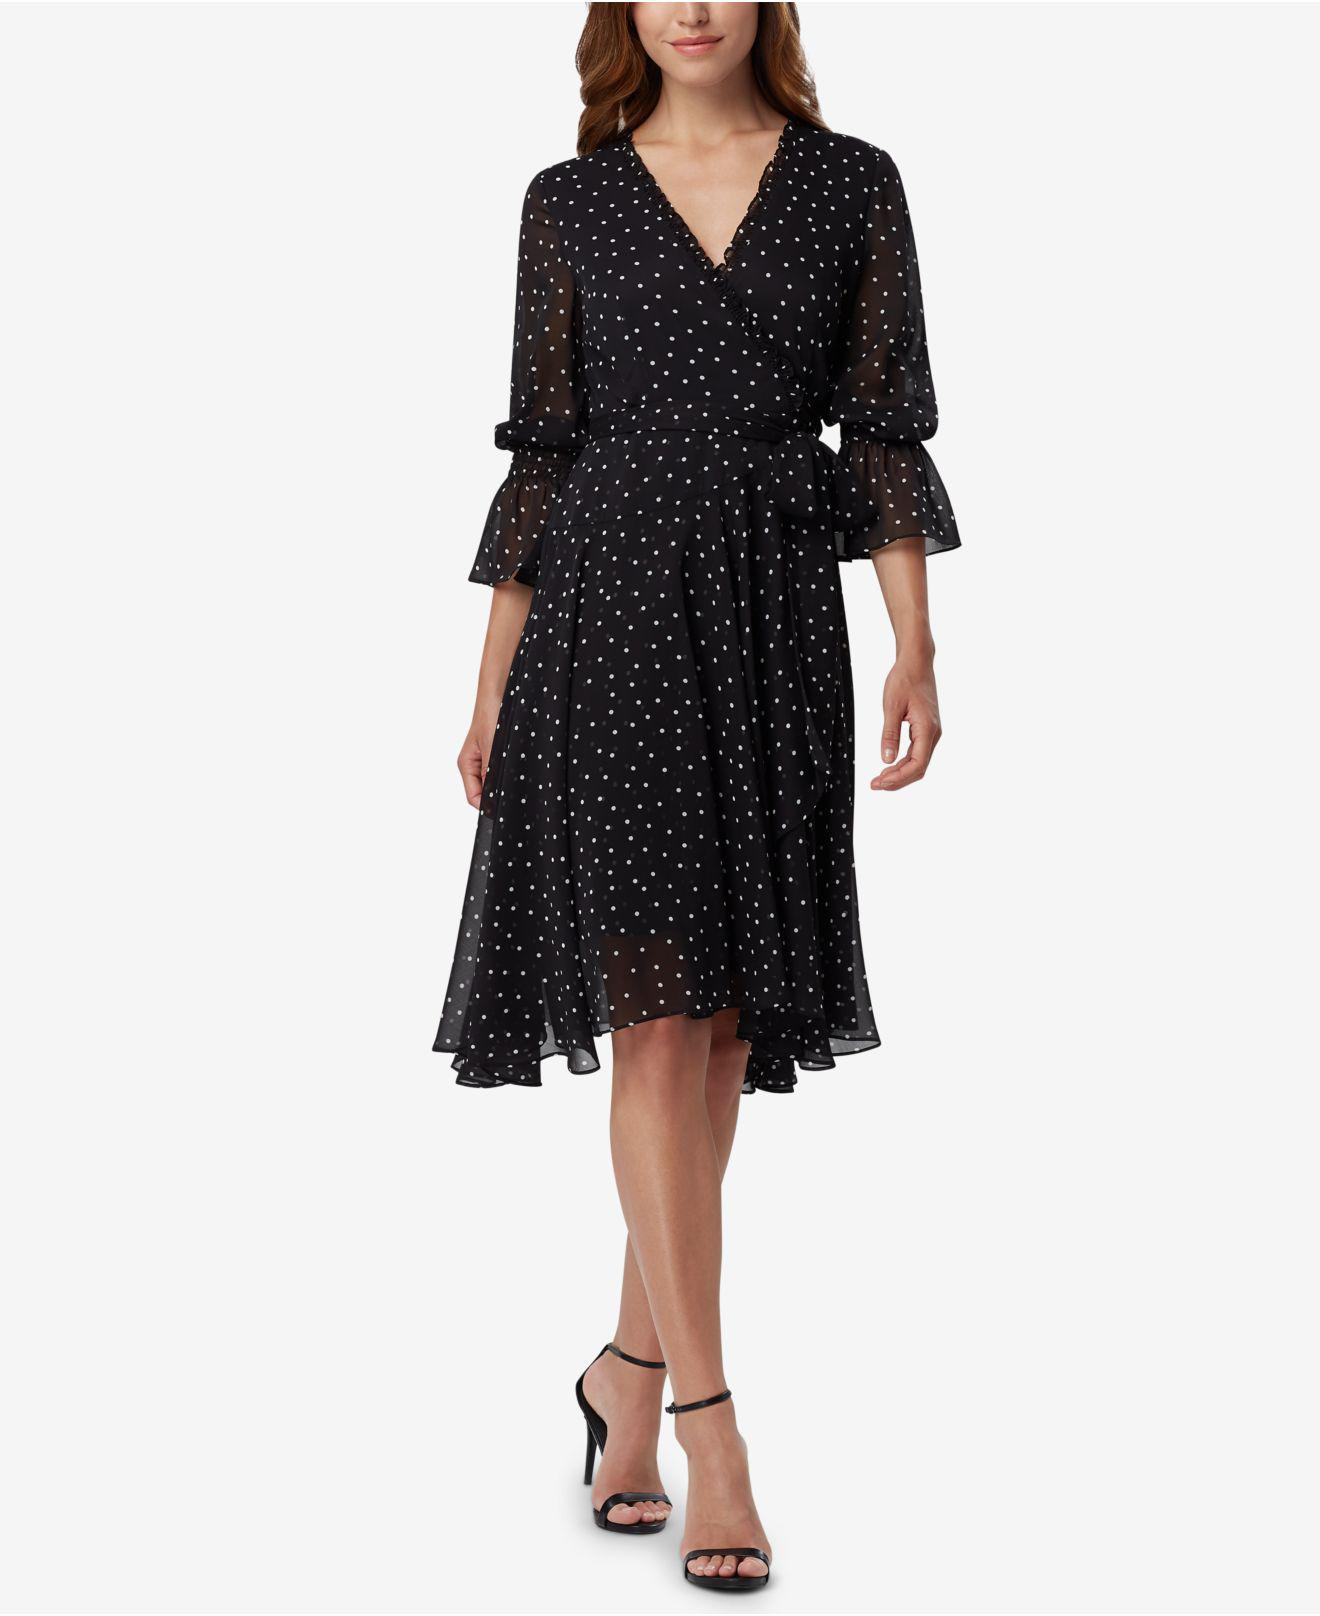 5e75aa226af Lyst - Tahari Asl Dot-print Faux-wrap Dress in Black